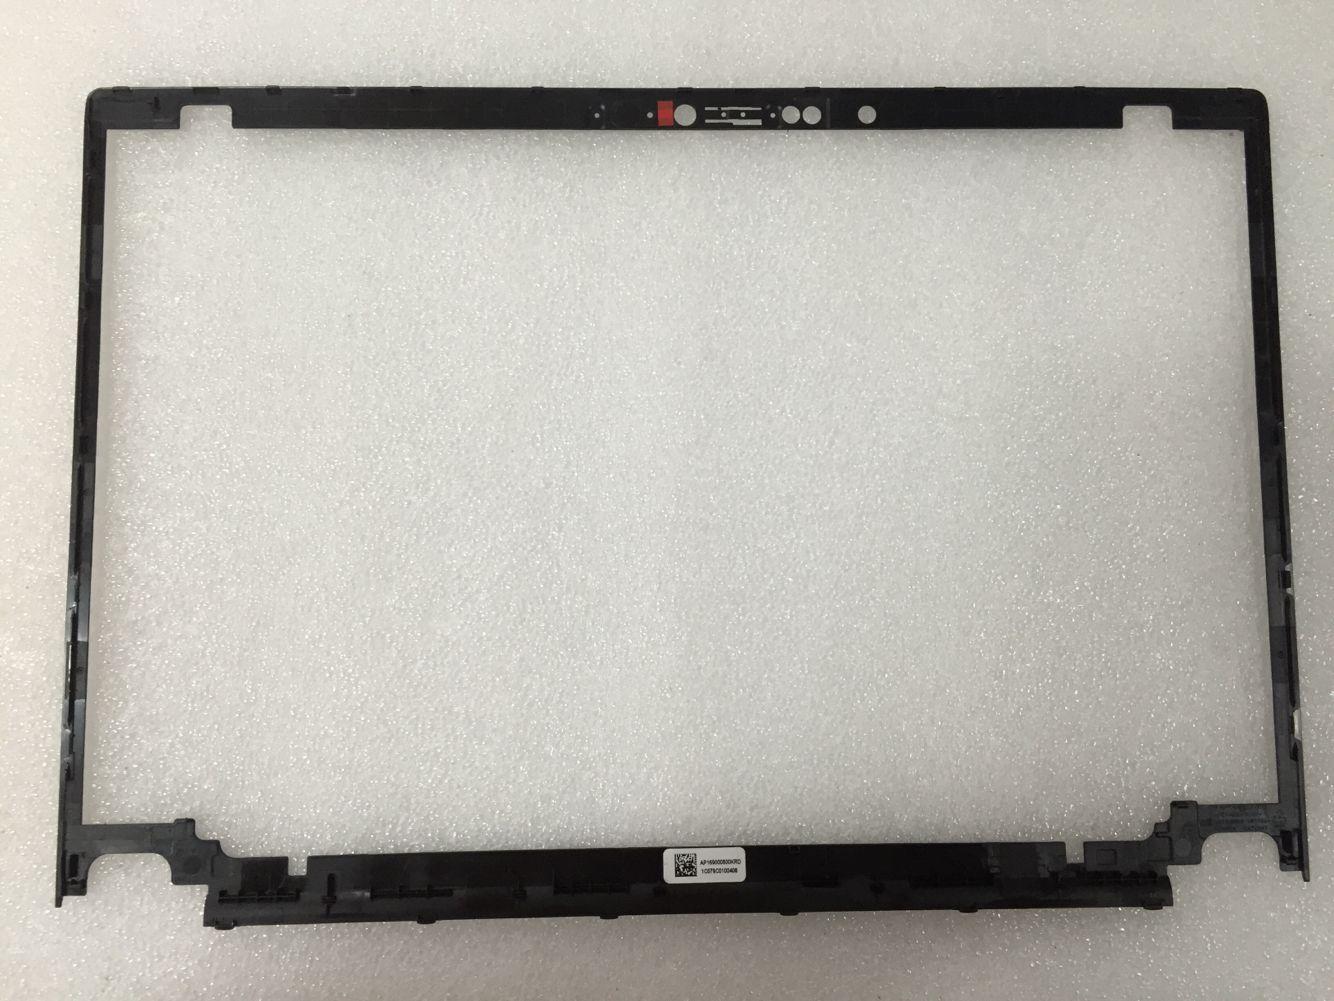 New For Lenovo IdeaPad Yoga S3 14 LCD Bezel Screen Cover Lcd Lid